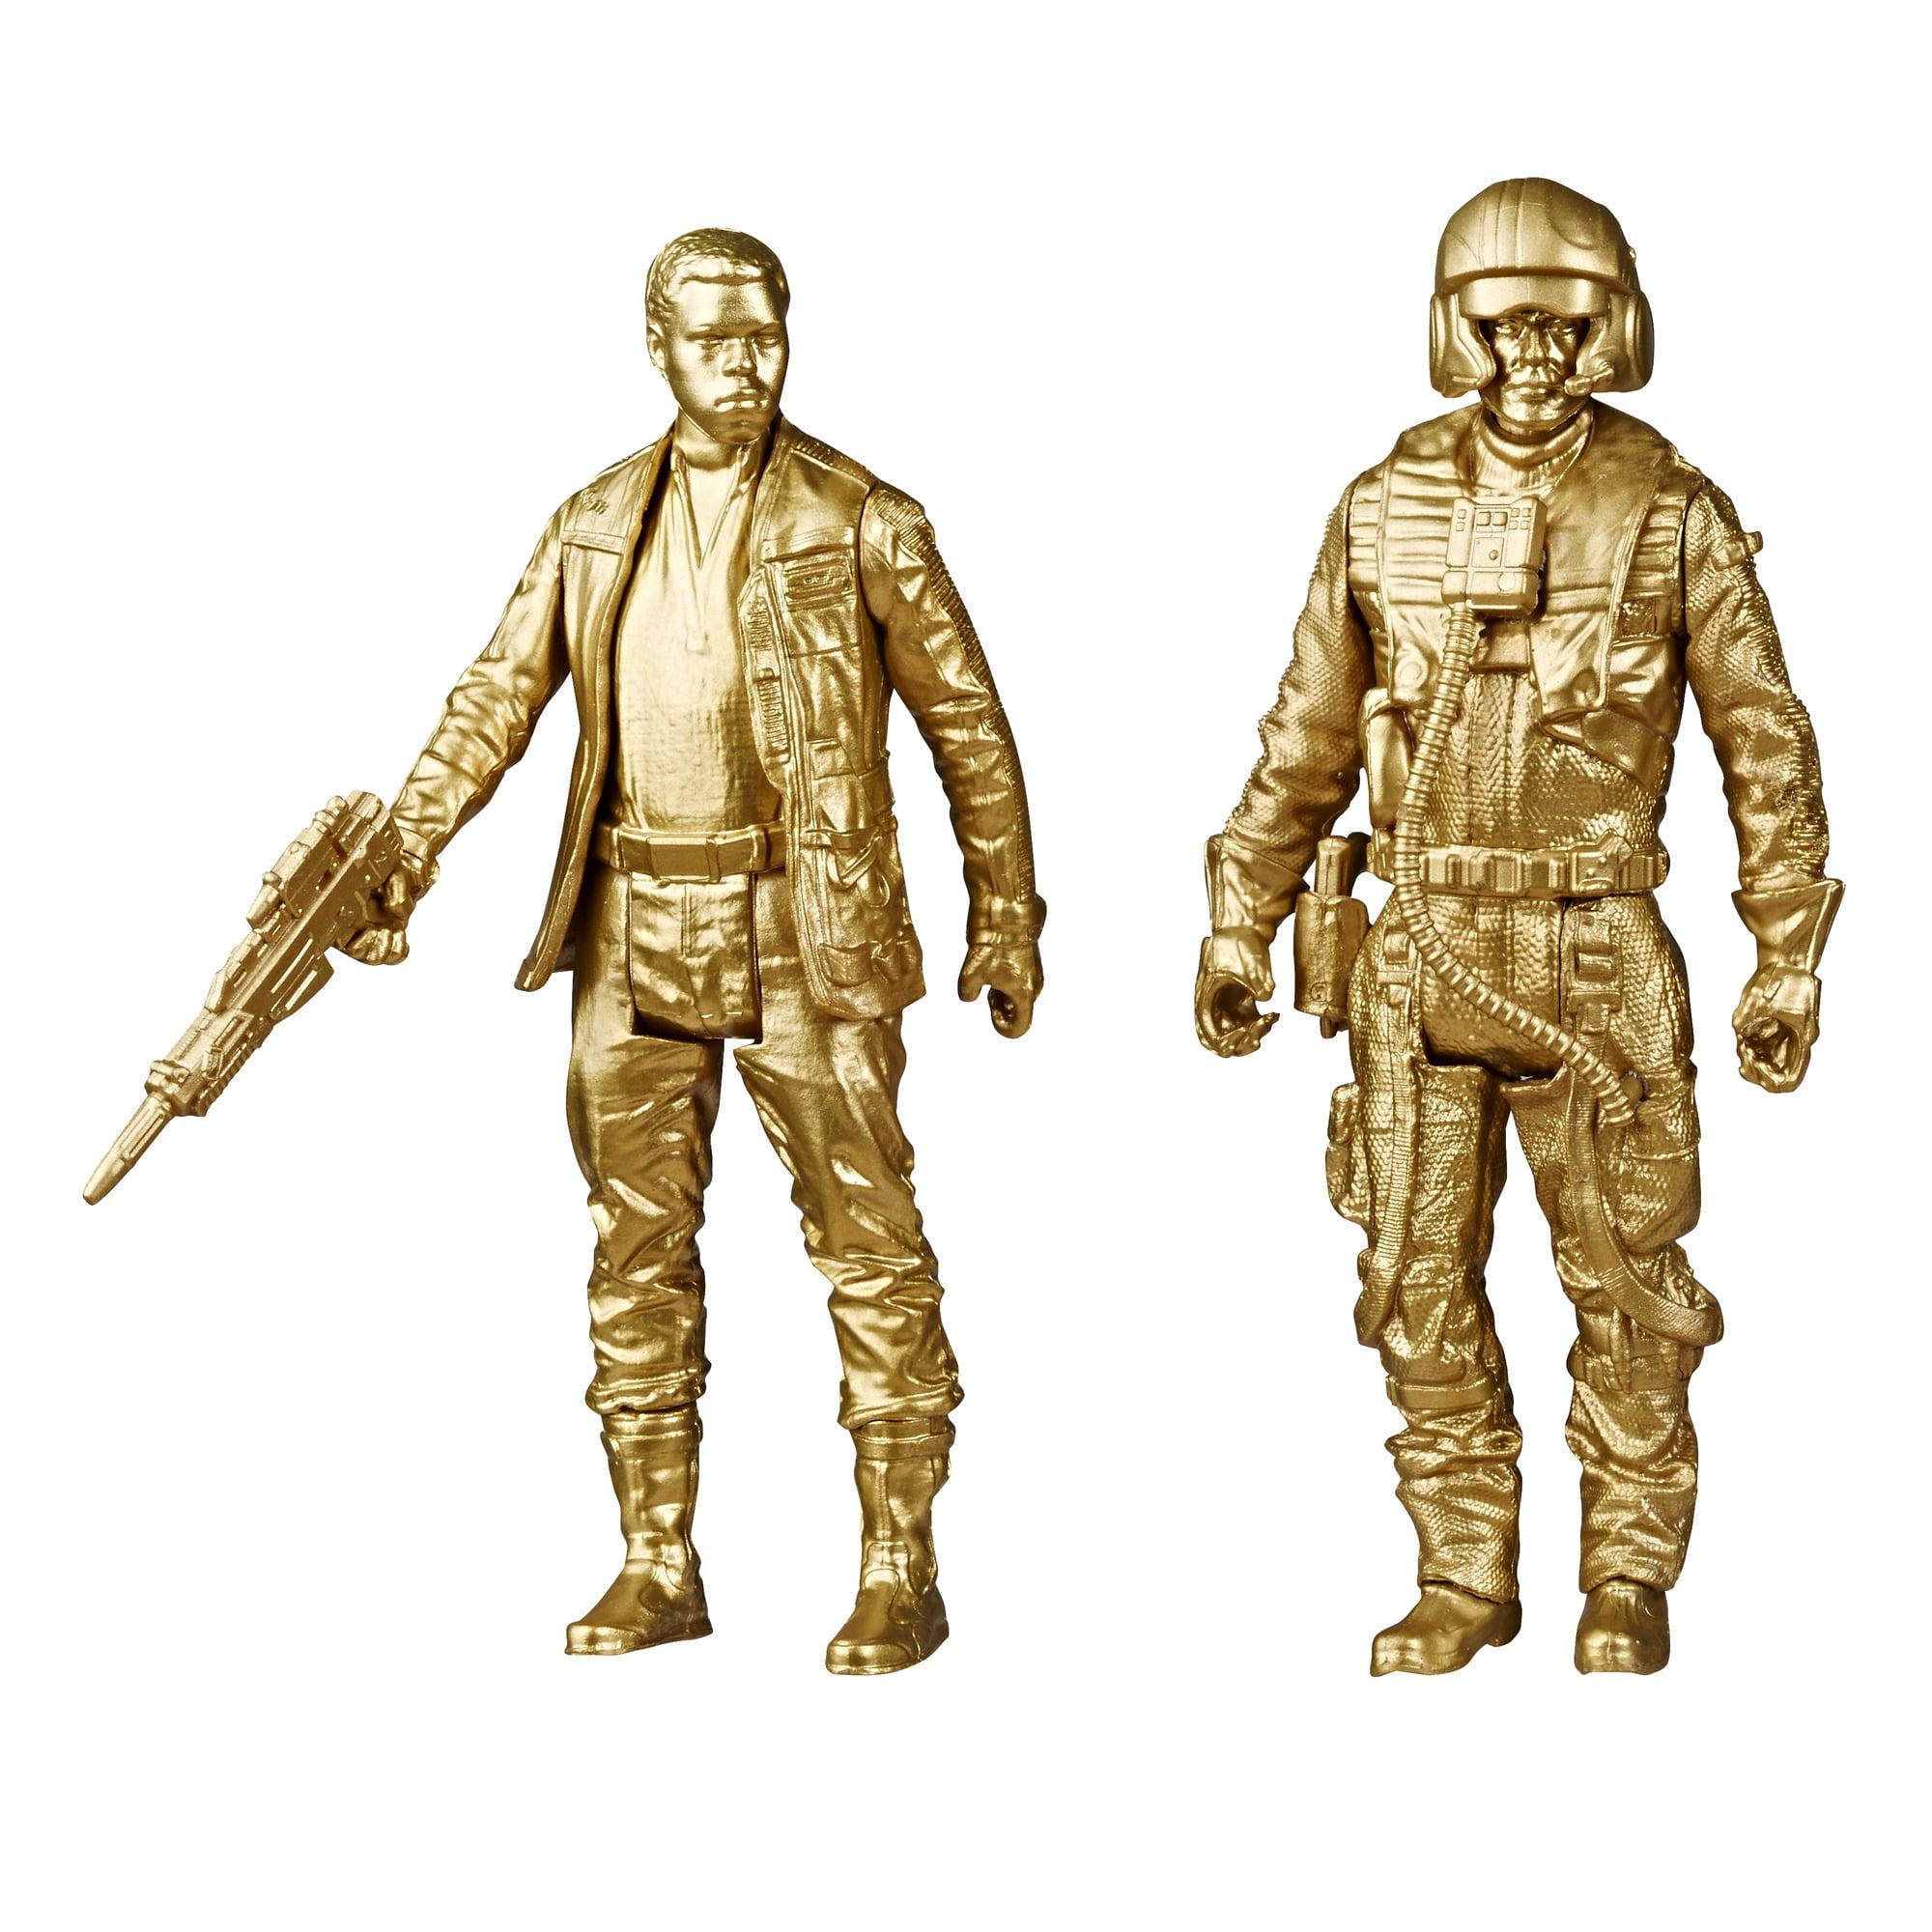 Star Wars Skywalker Saga 3.75-inch Finn and Poe Dameron 2-Pack Action Figure